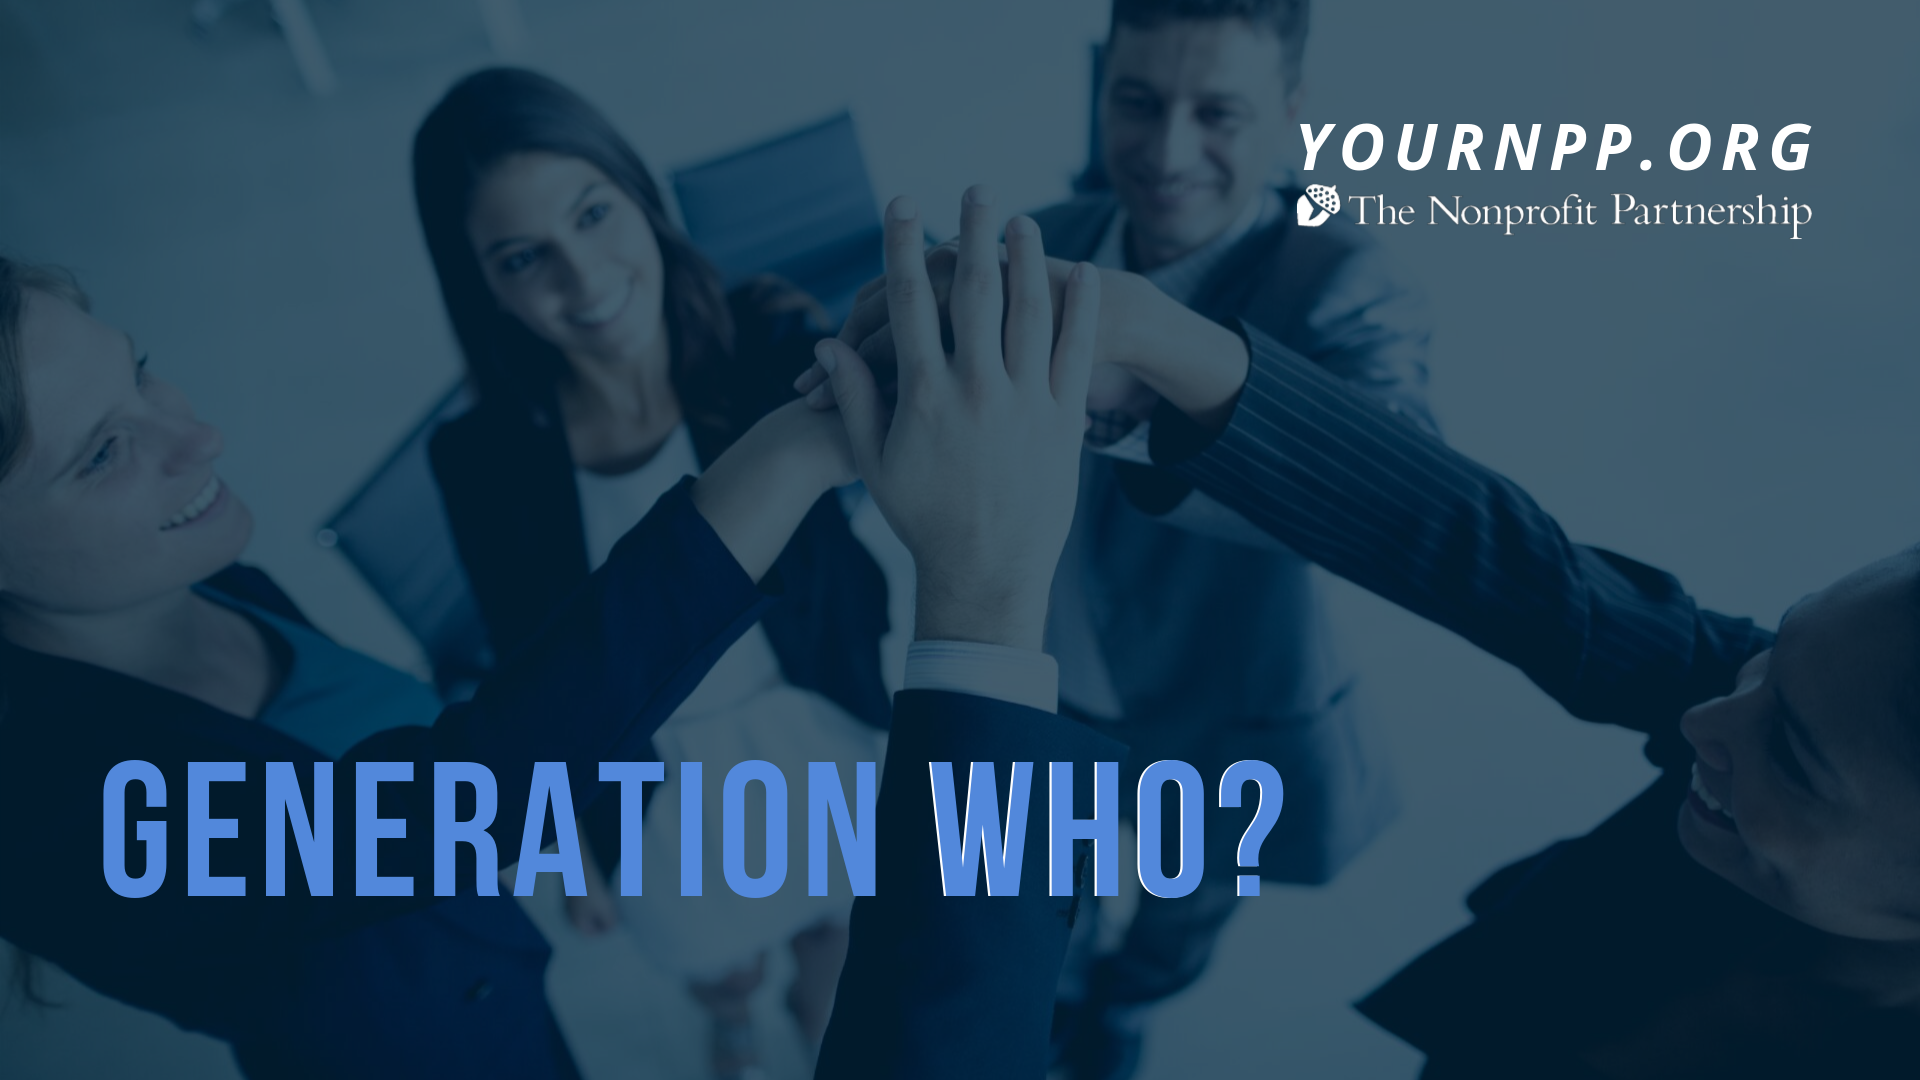 Generation Who?